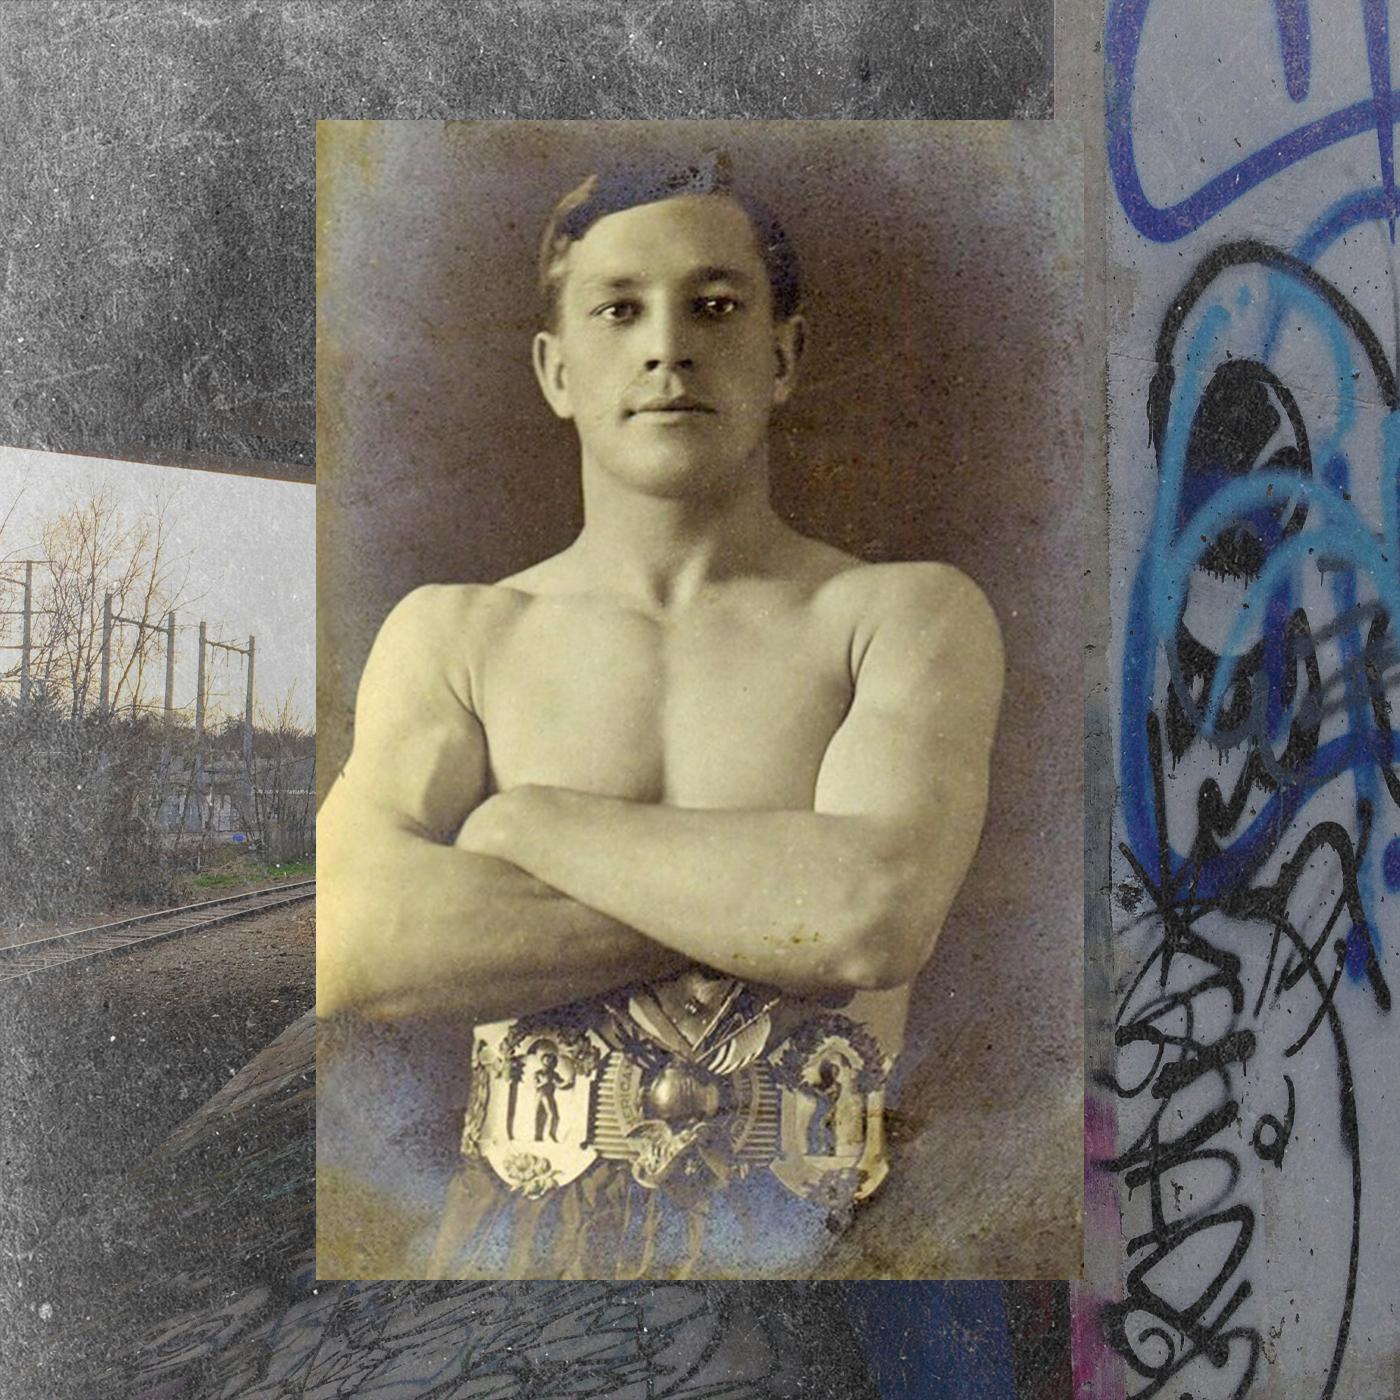 Stanley Ketchel, champion